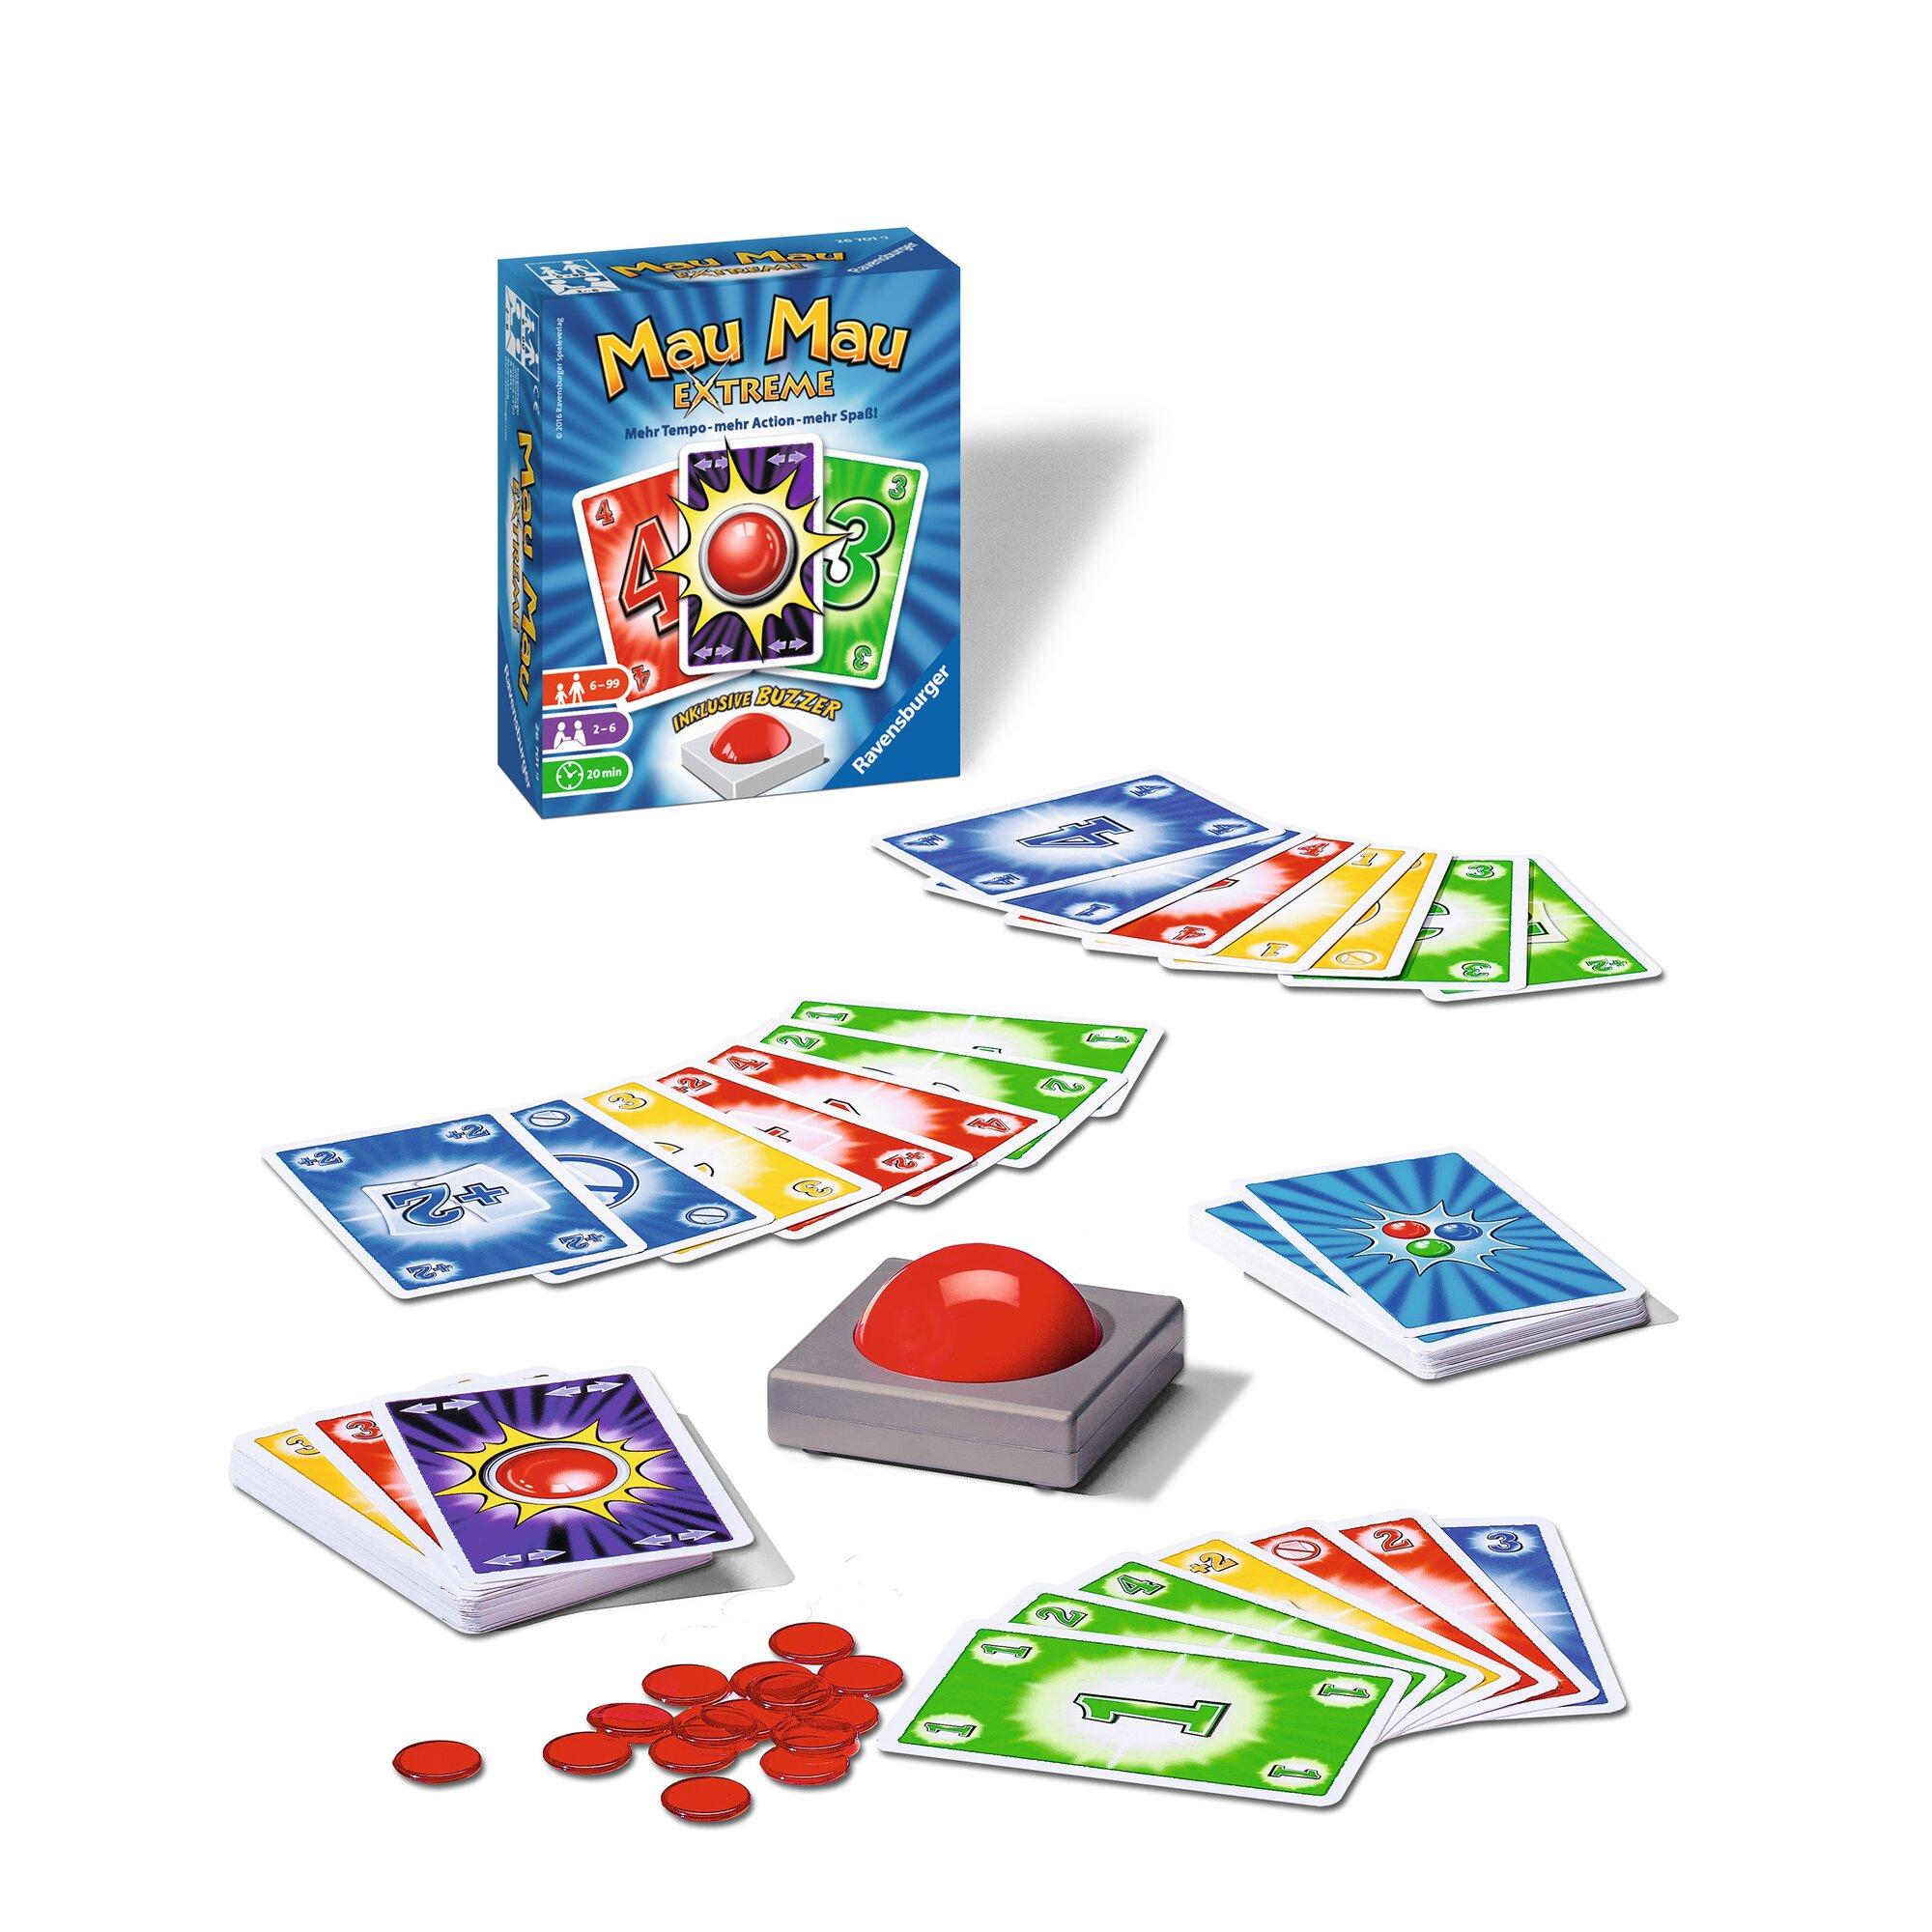 ravensburger-mau-mau-extreme-kartenspiel